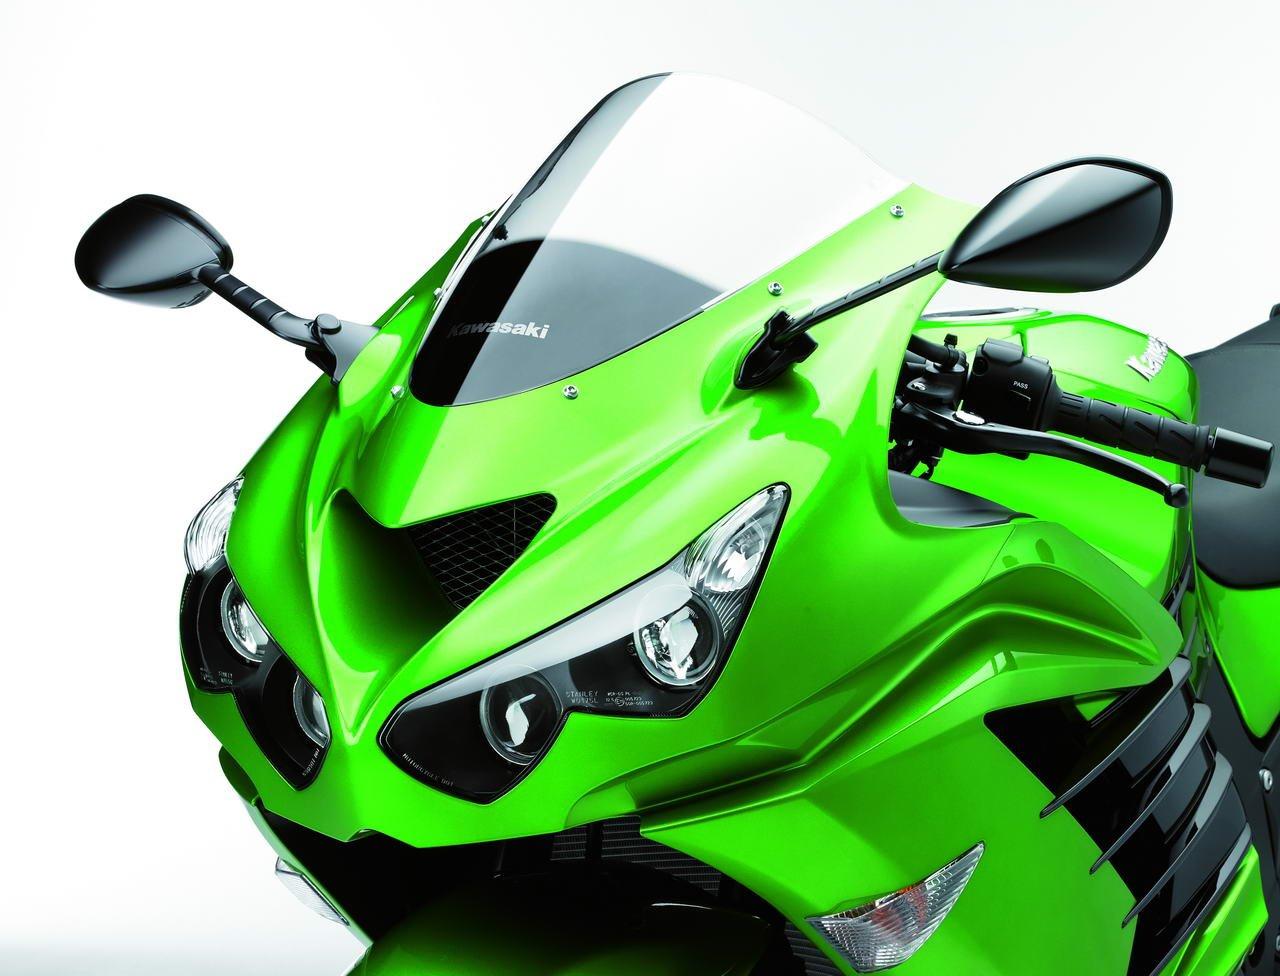 Listino Kawasaki Ninja ZX-10R SuperBike 1000 - image 15551_kawasaki-zzr1400abs on https://moto.motori.net